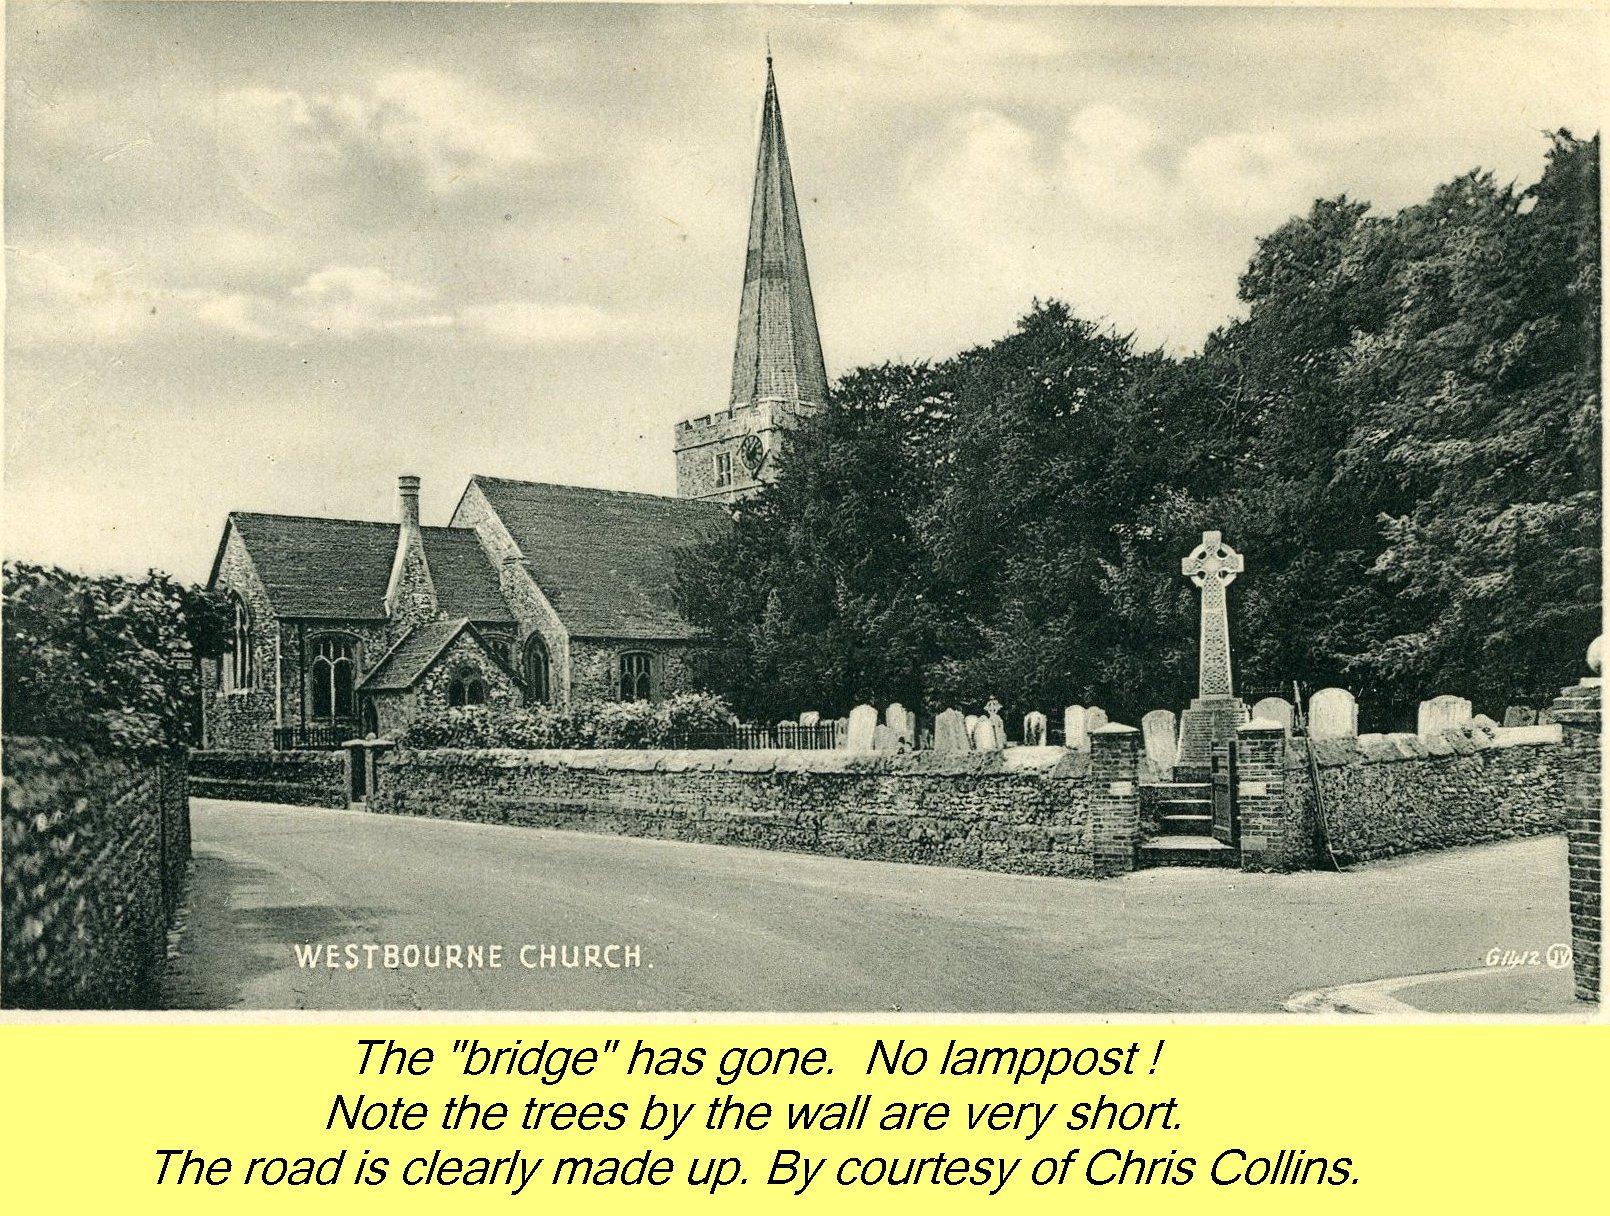 WESTBOURNE HISTORY PHOTO, CHURCH, St. JOHN, YEW, INTERIOR, SCREEN, MEMORIAL